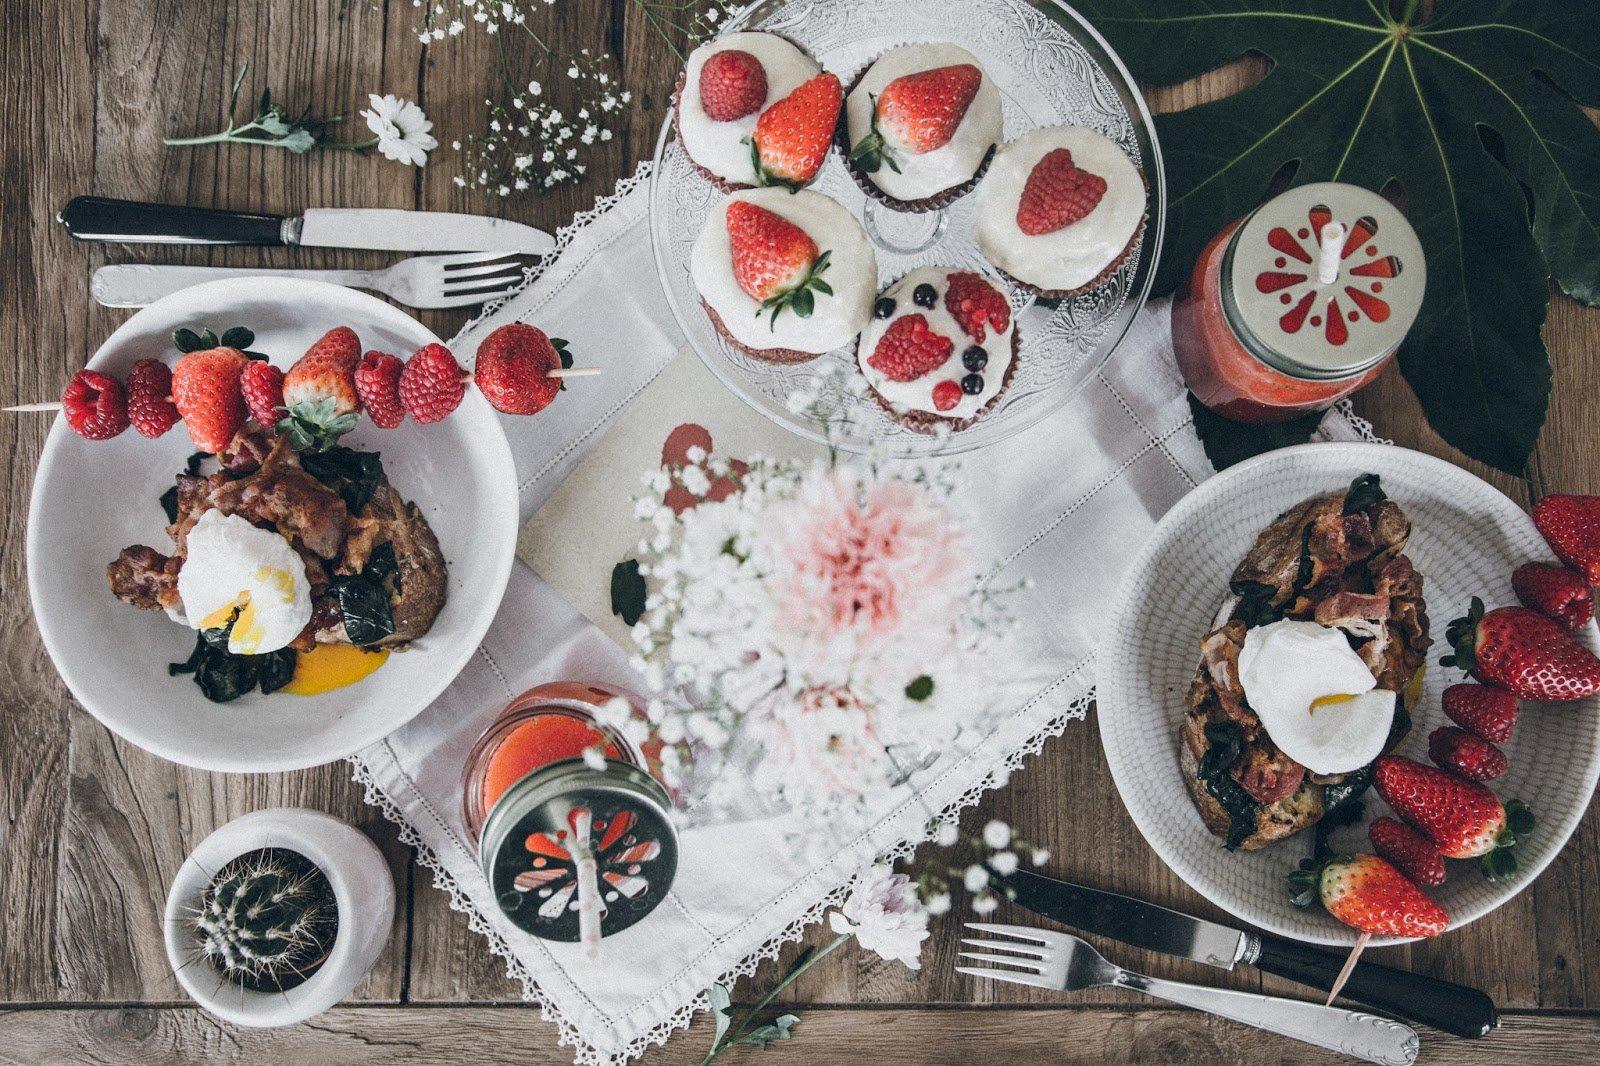 brunch sp cial saint valentin da quiri fraise pink cupcakes toasts bacon oeufs poches. Black Bedroom Furniture Sets. Home Design Ideas